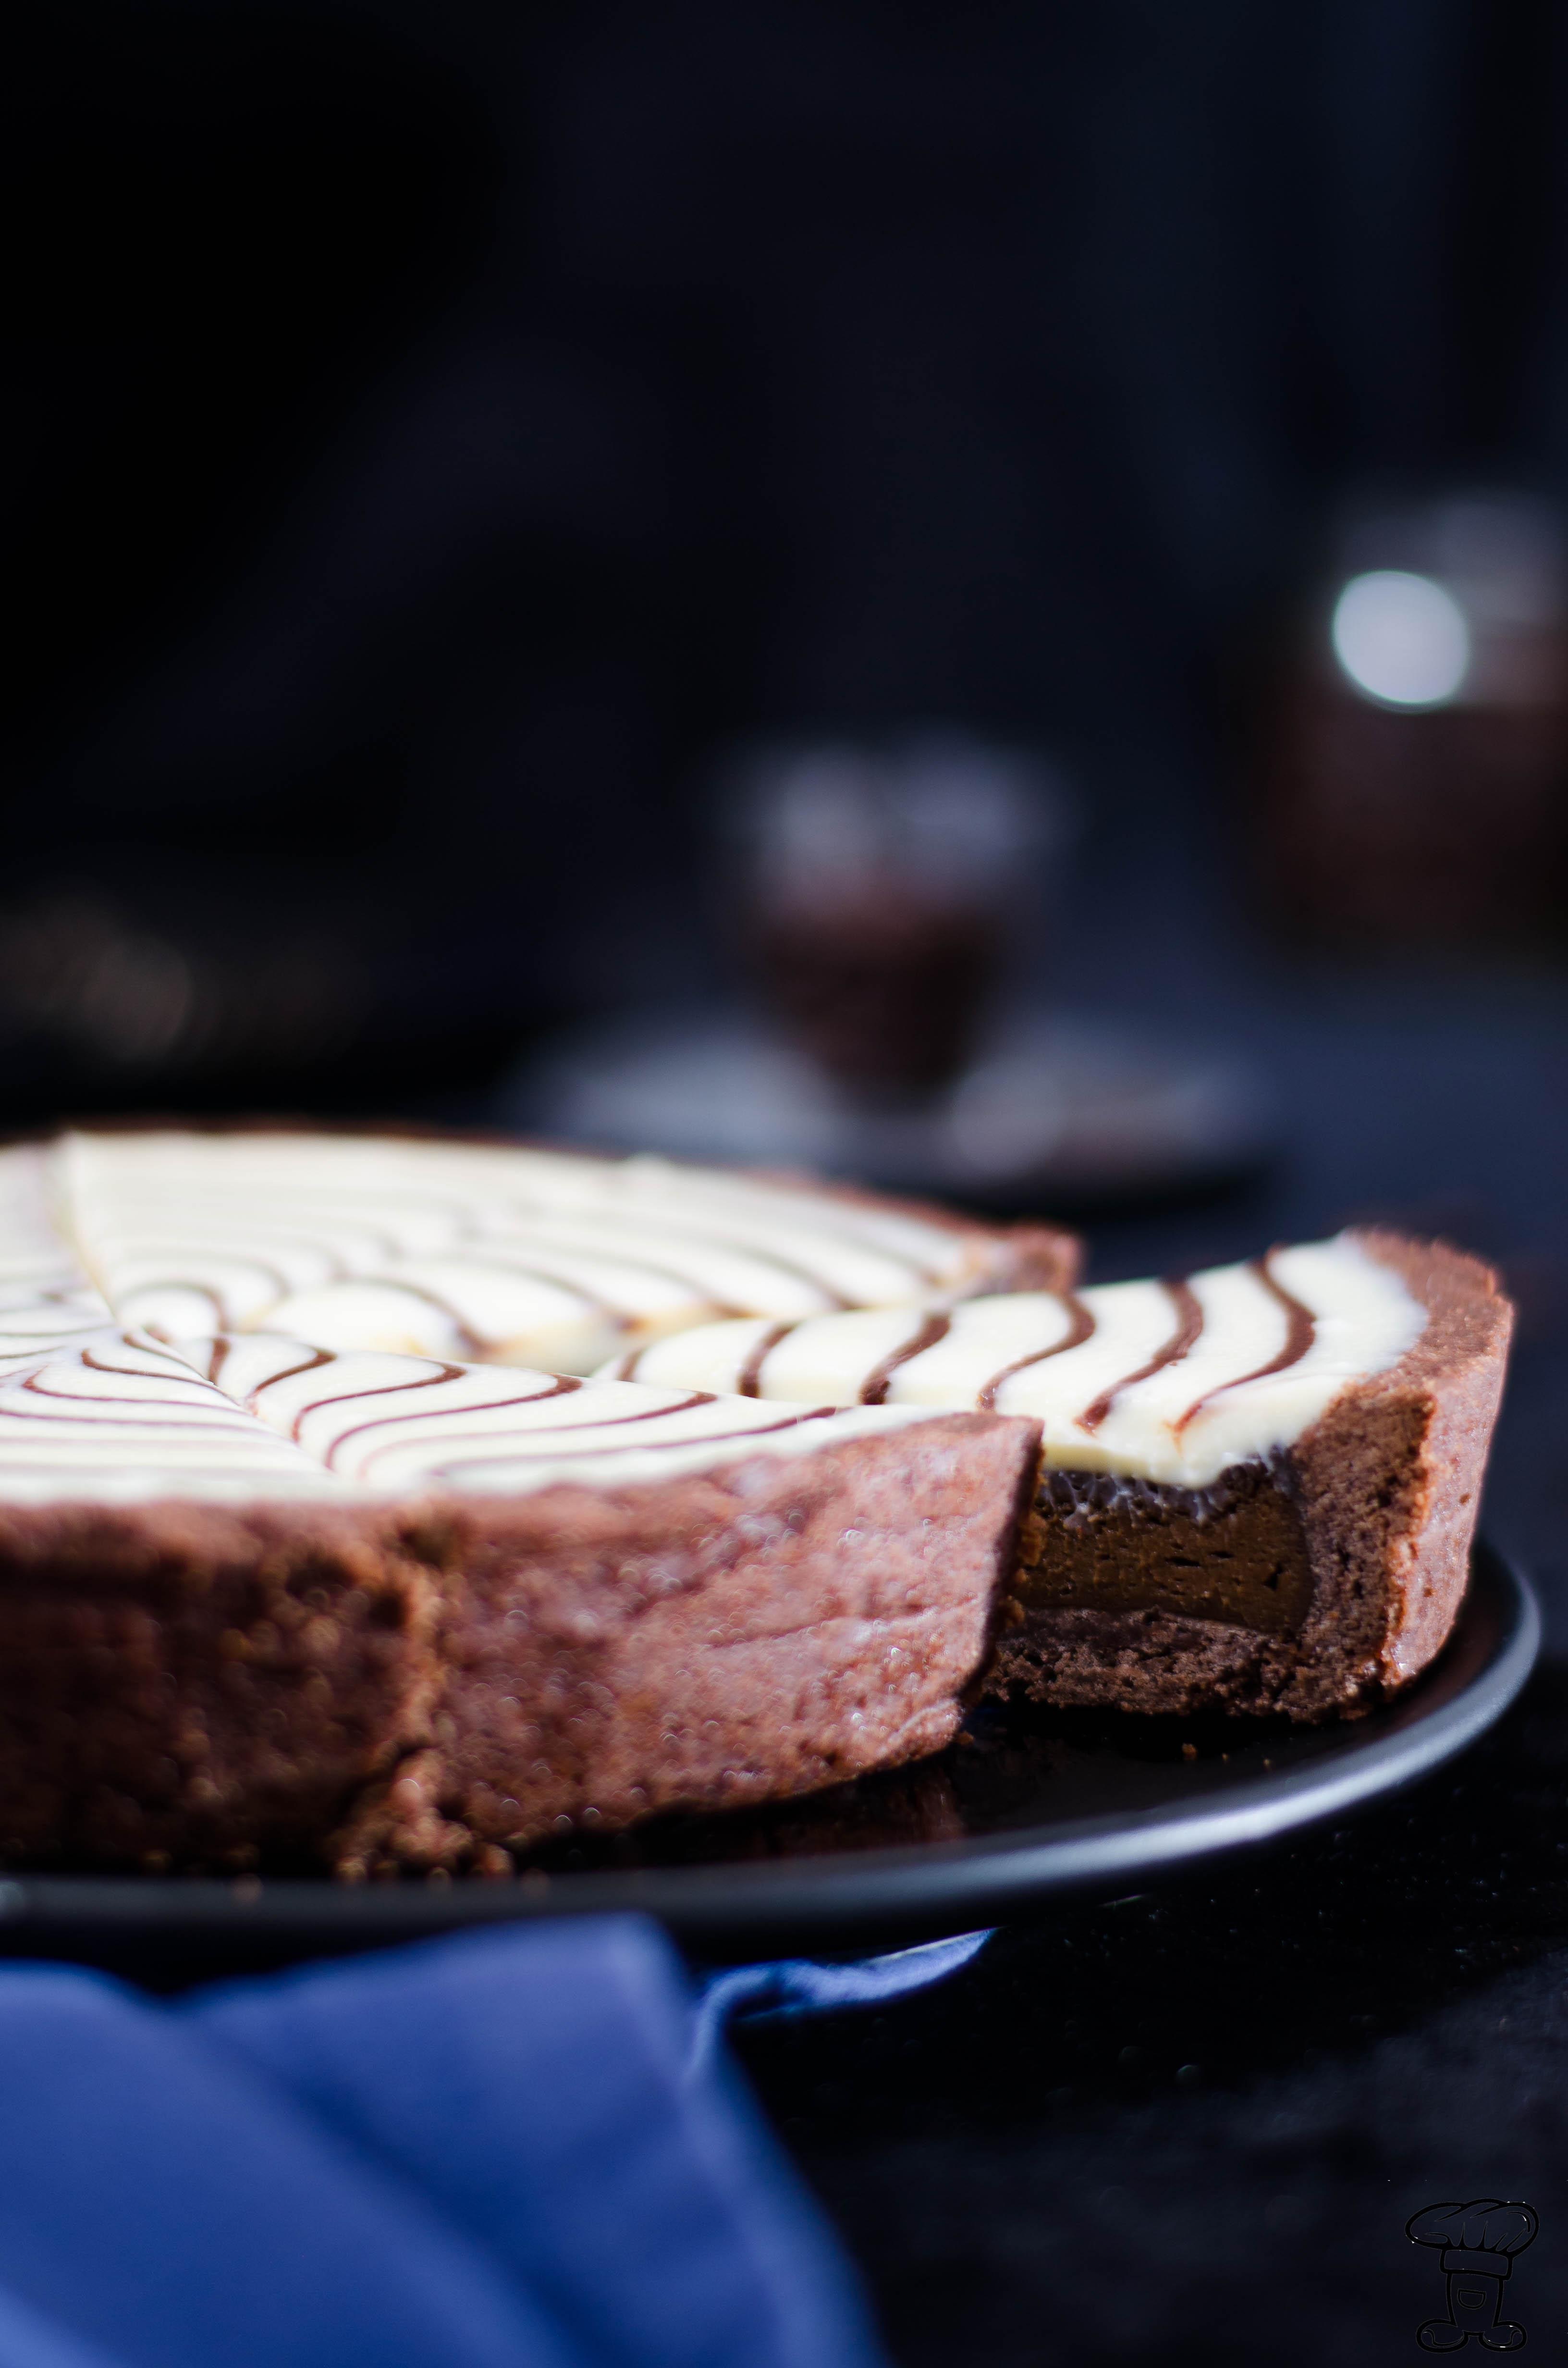 torta_mocaccino_knam4 Torta mocaccino di Knam